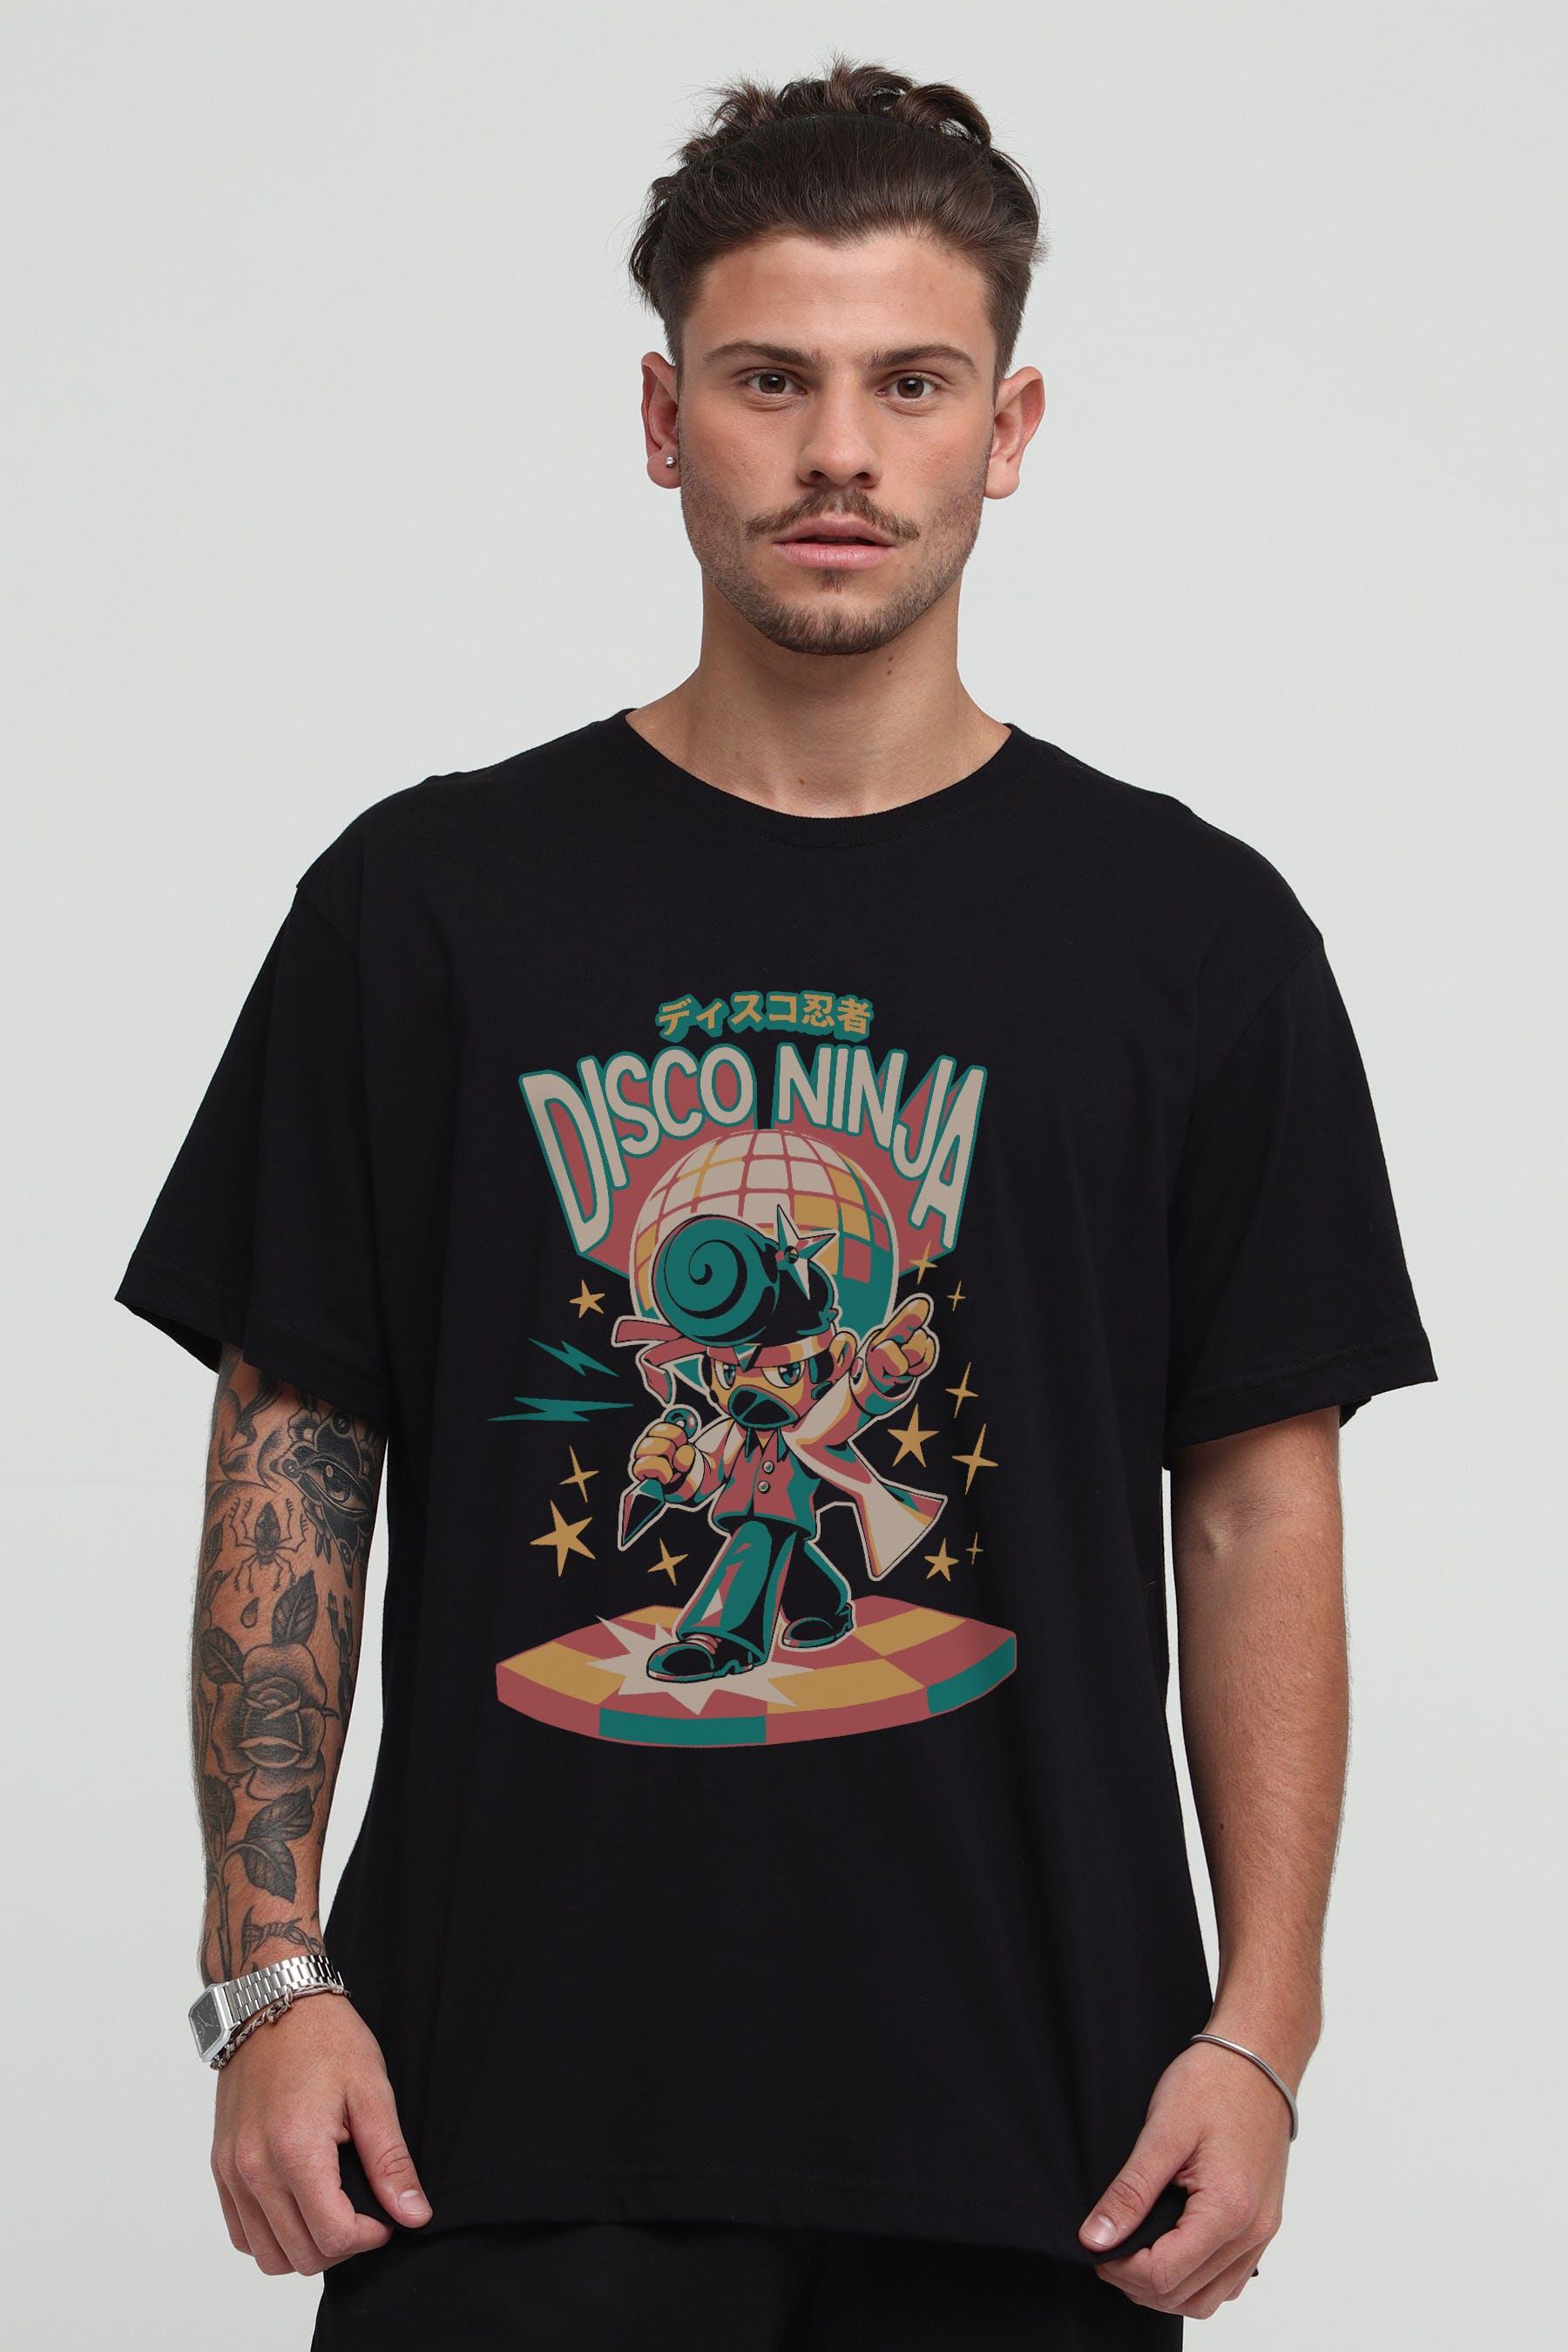 Camiseta Disco Ninja